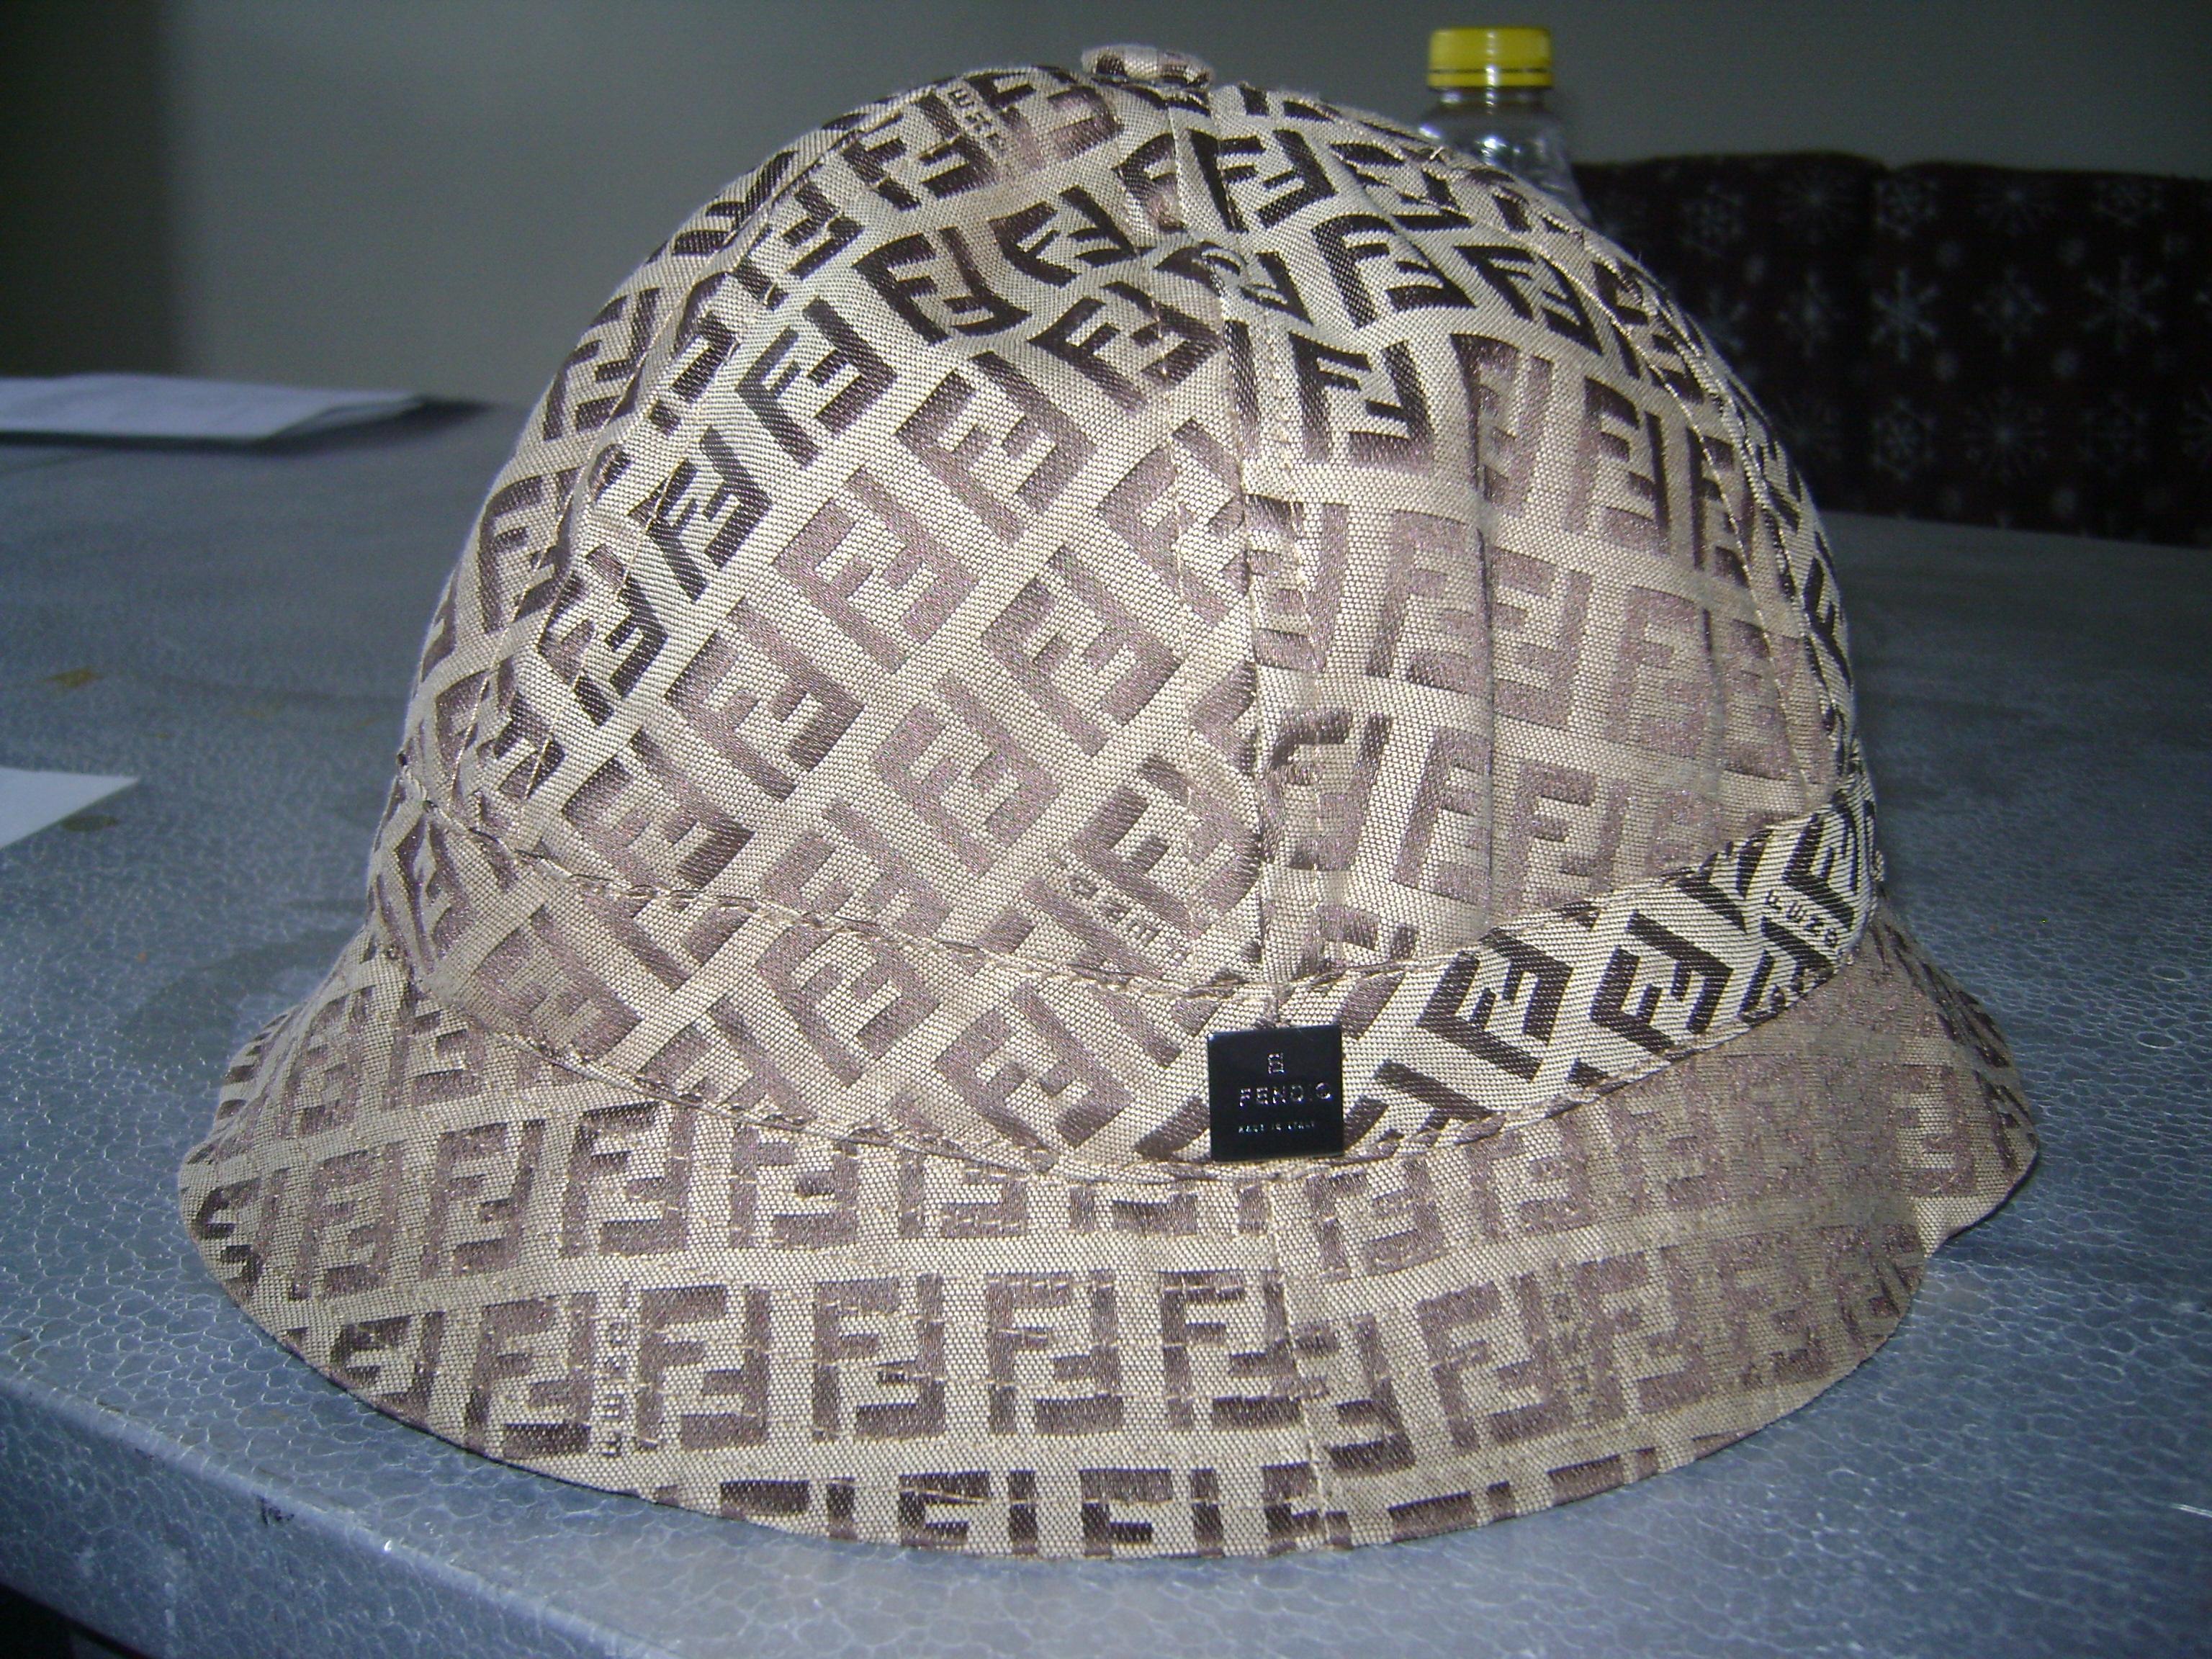 Pirates Log 164= fendi hat + benetton sweatshirt+ ...